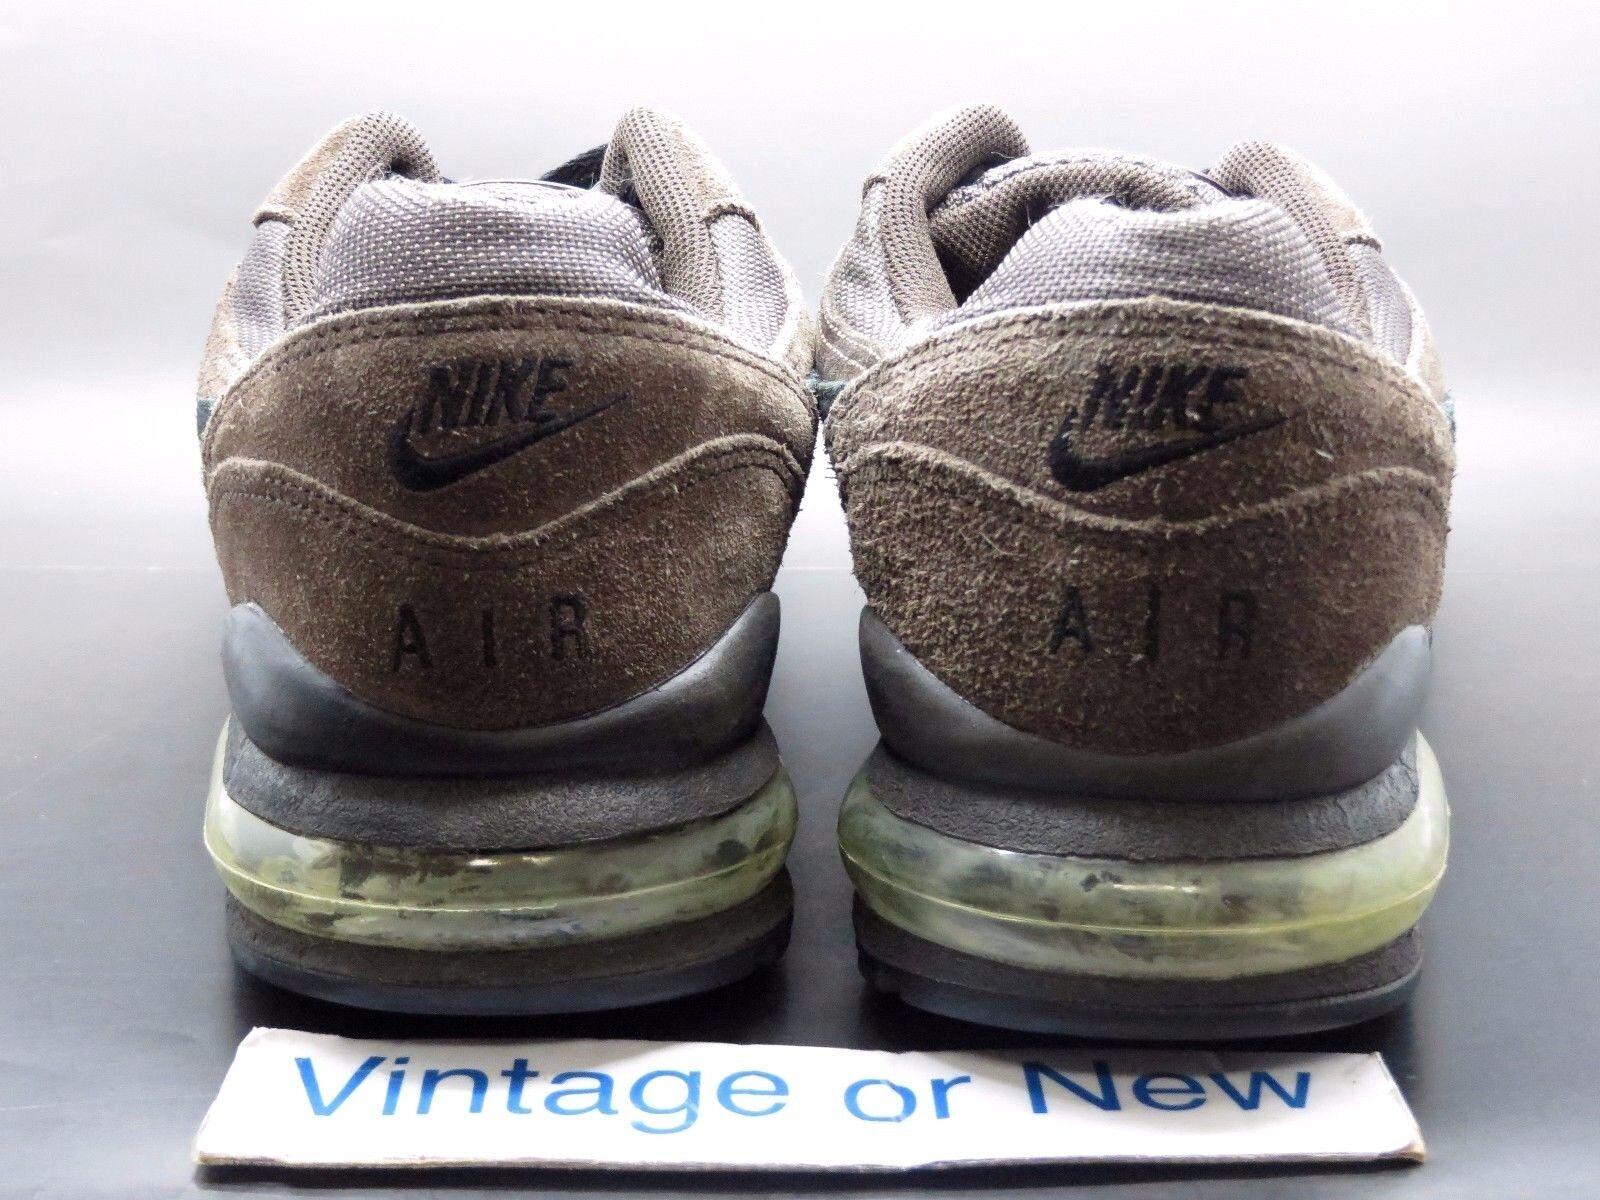 Nike air max brach dunkle asche schwarzen Braun schwarzen asche wildleder laufschuhe 2003 sz. 2f76e8